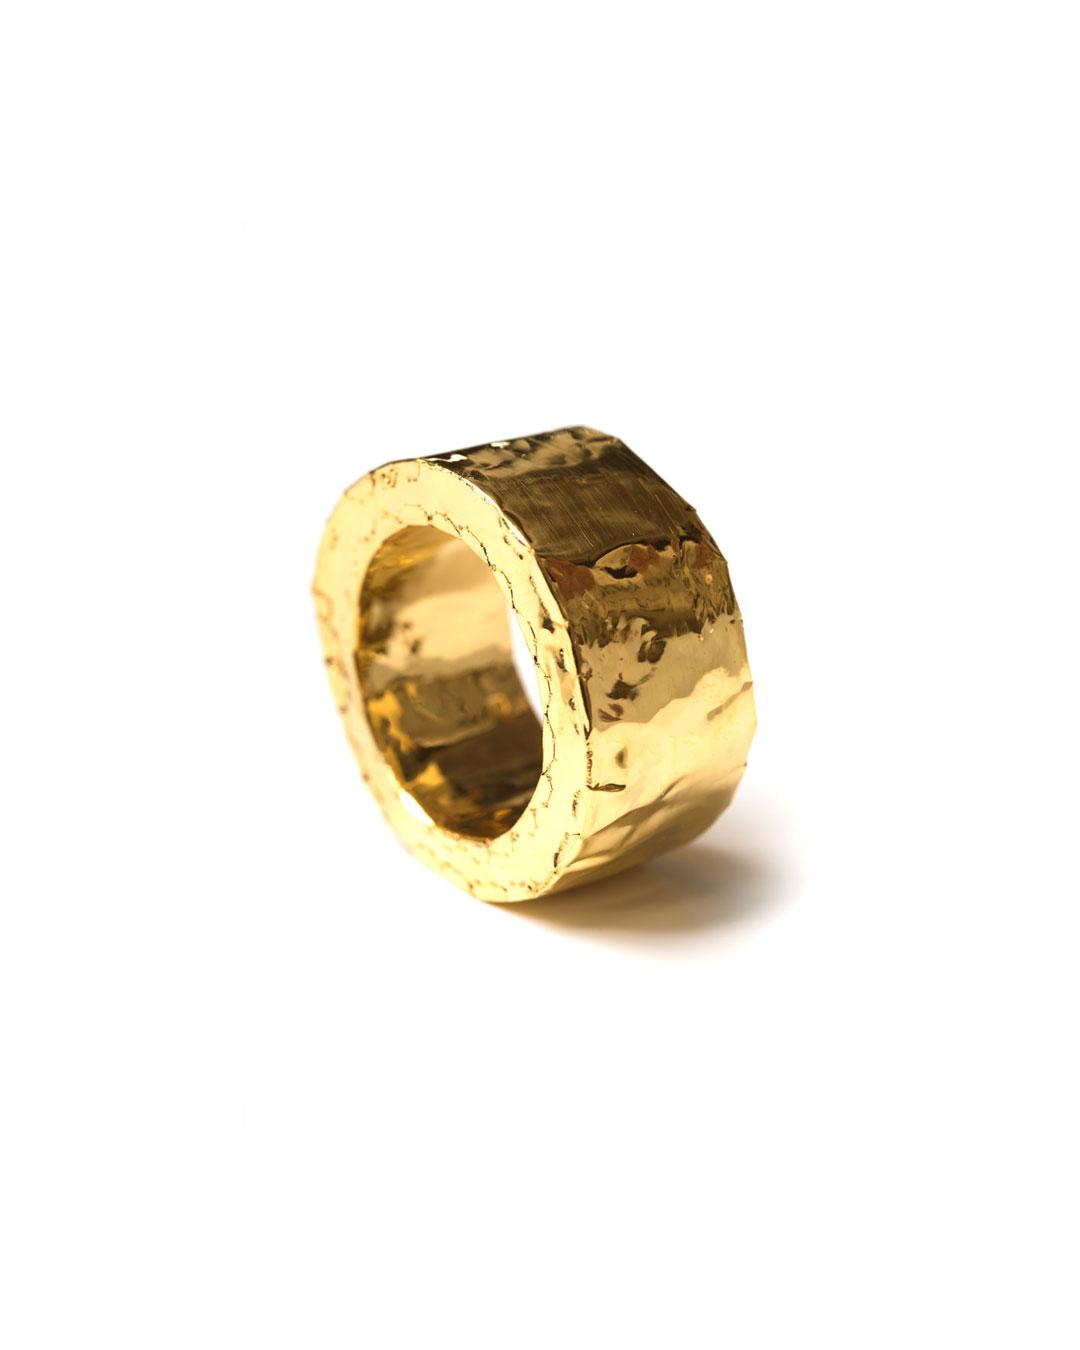 Carla Nuis, Furl 5, 2018, ring; fine gold, 30 x 30 x 4 mm, €1250